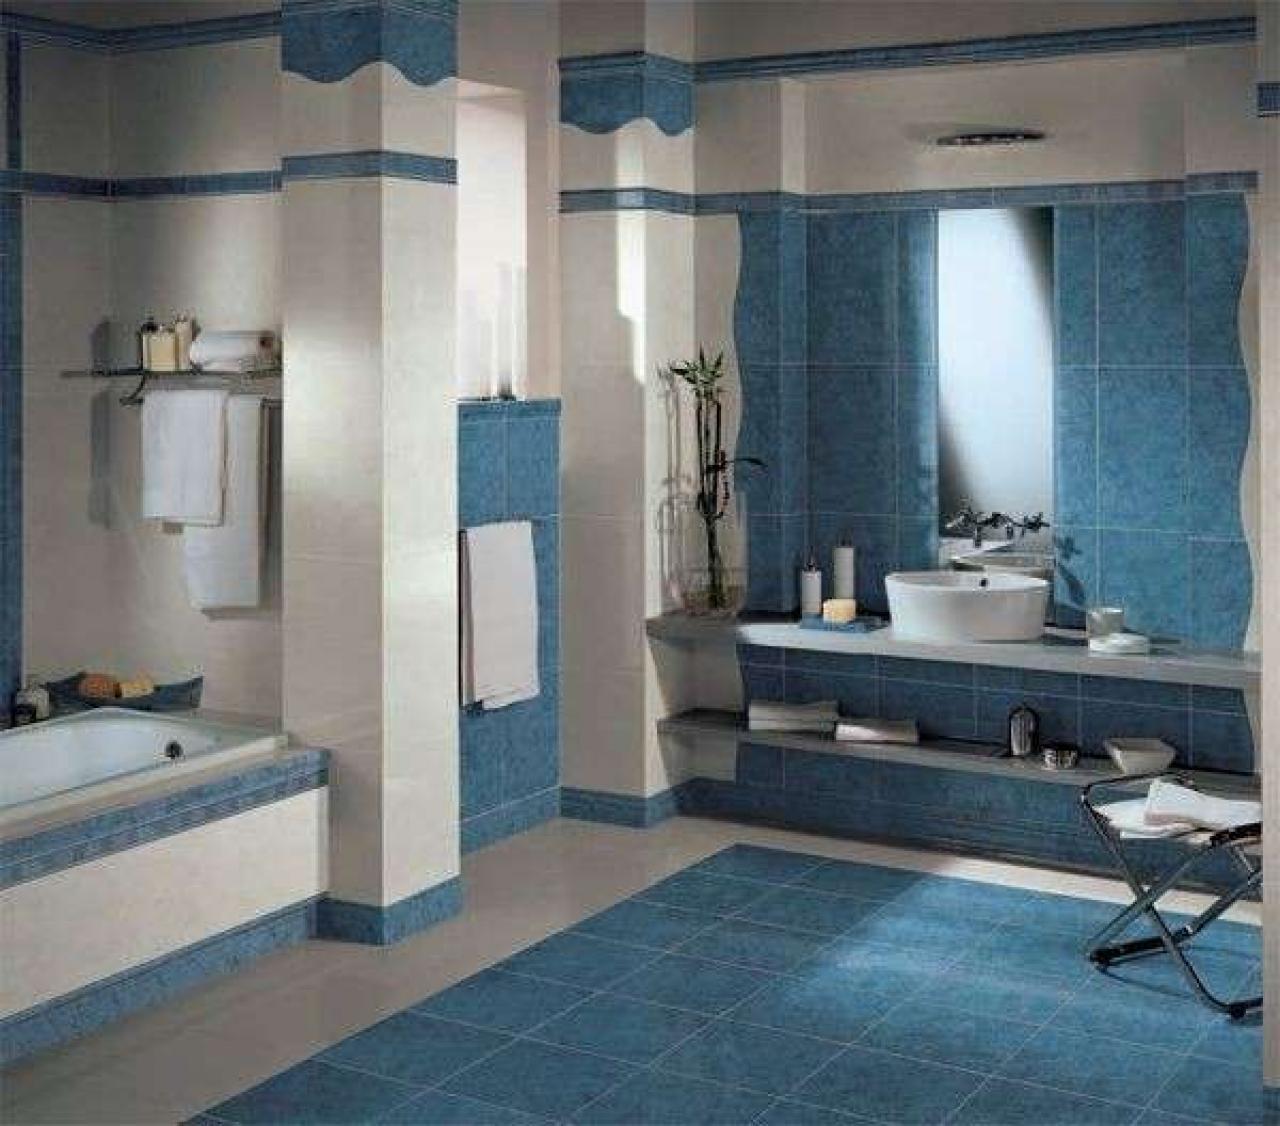 Il bagno secondo le teorie del feng shui pellizzari - Feng shui bagno ...